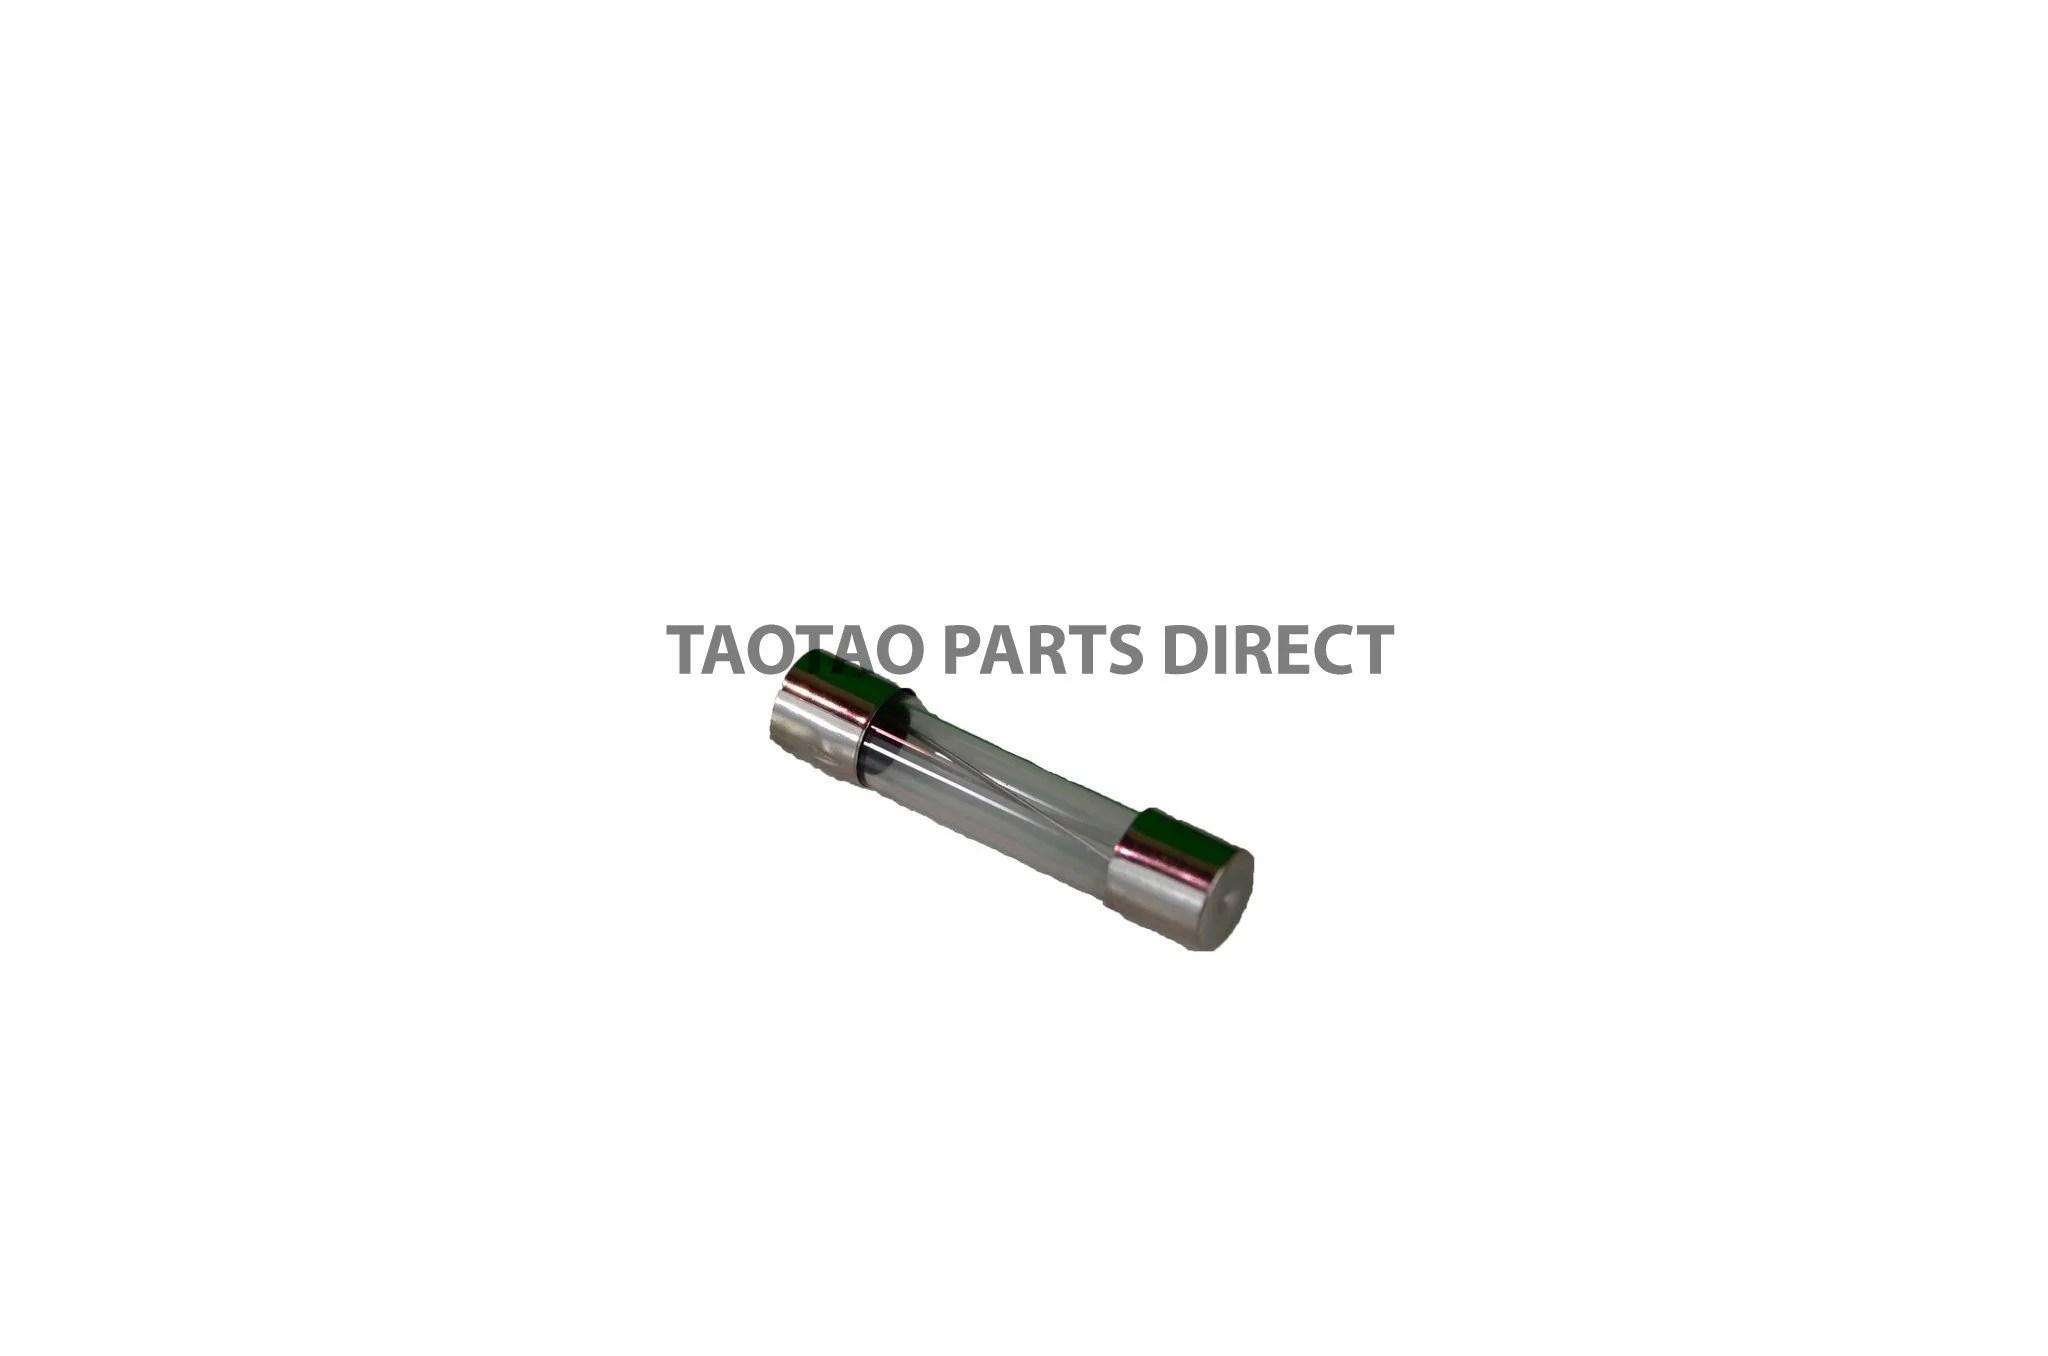 hight resolution of taotao fuse box wiring diagram10ah glass fuse taotao parts direct10ah glass fuse taotaopartsdirect com